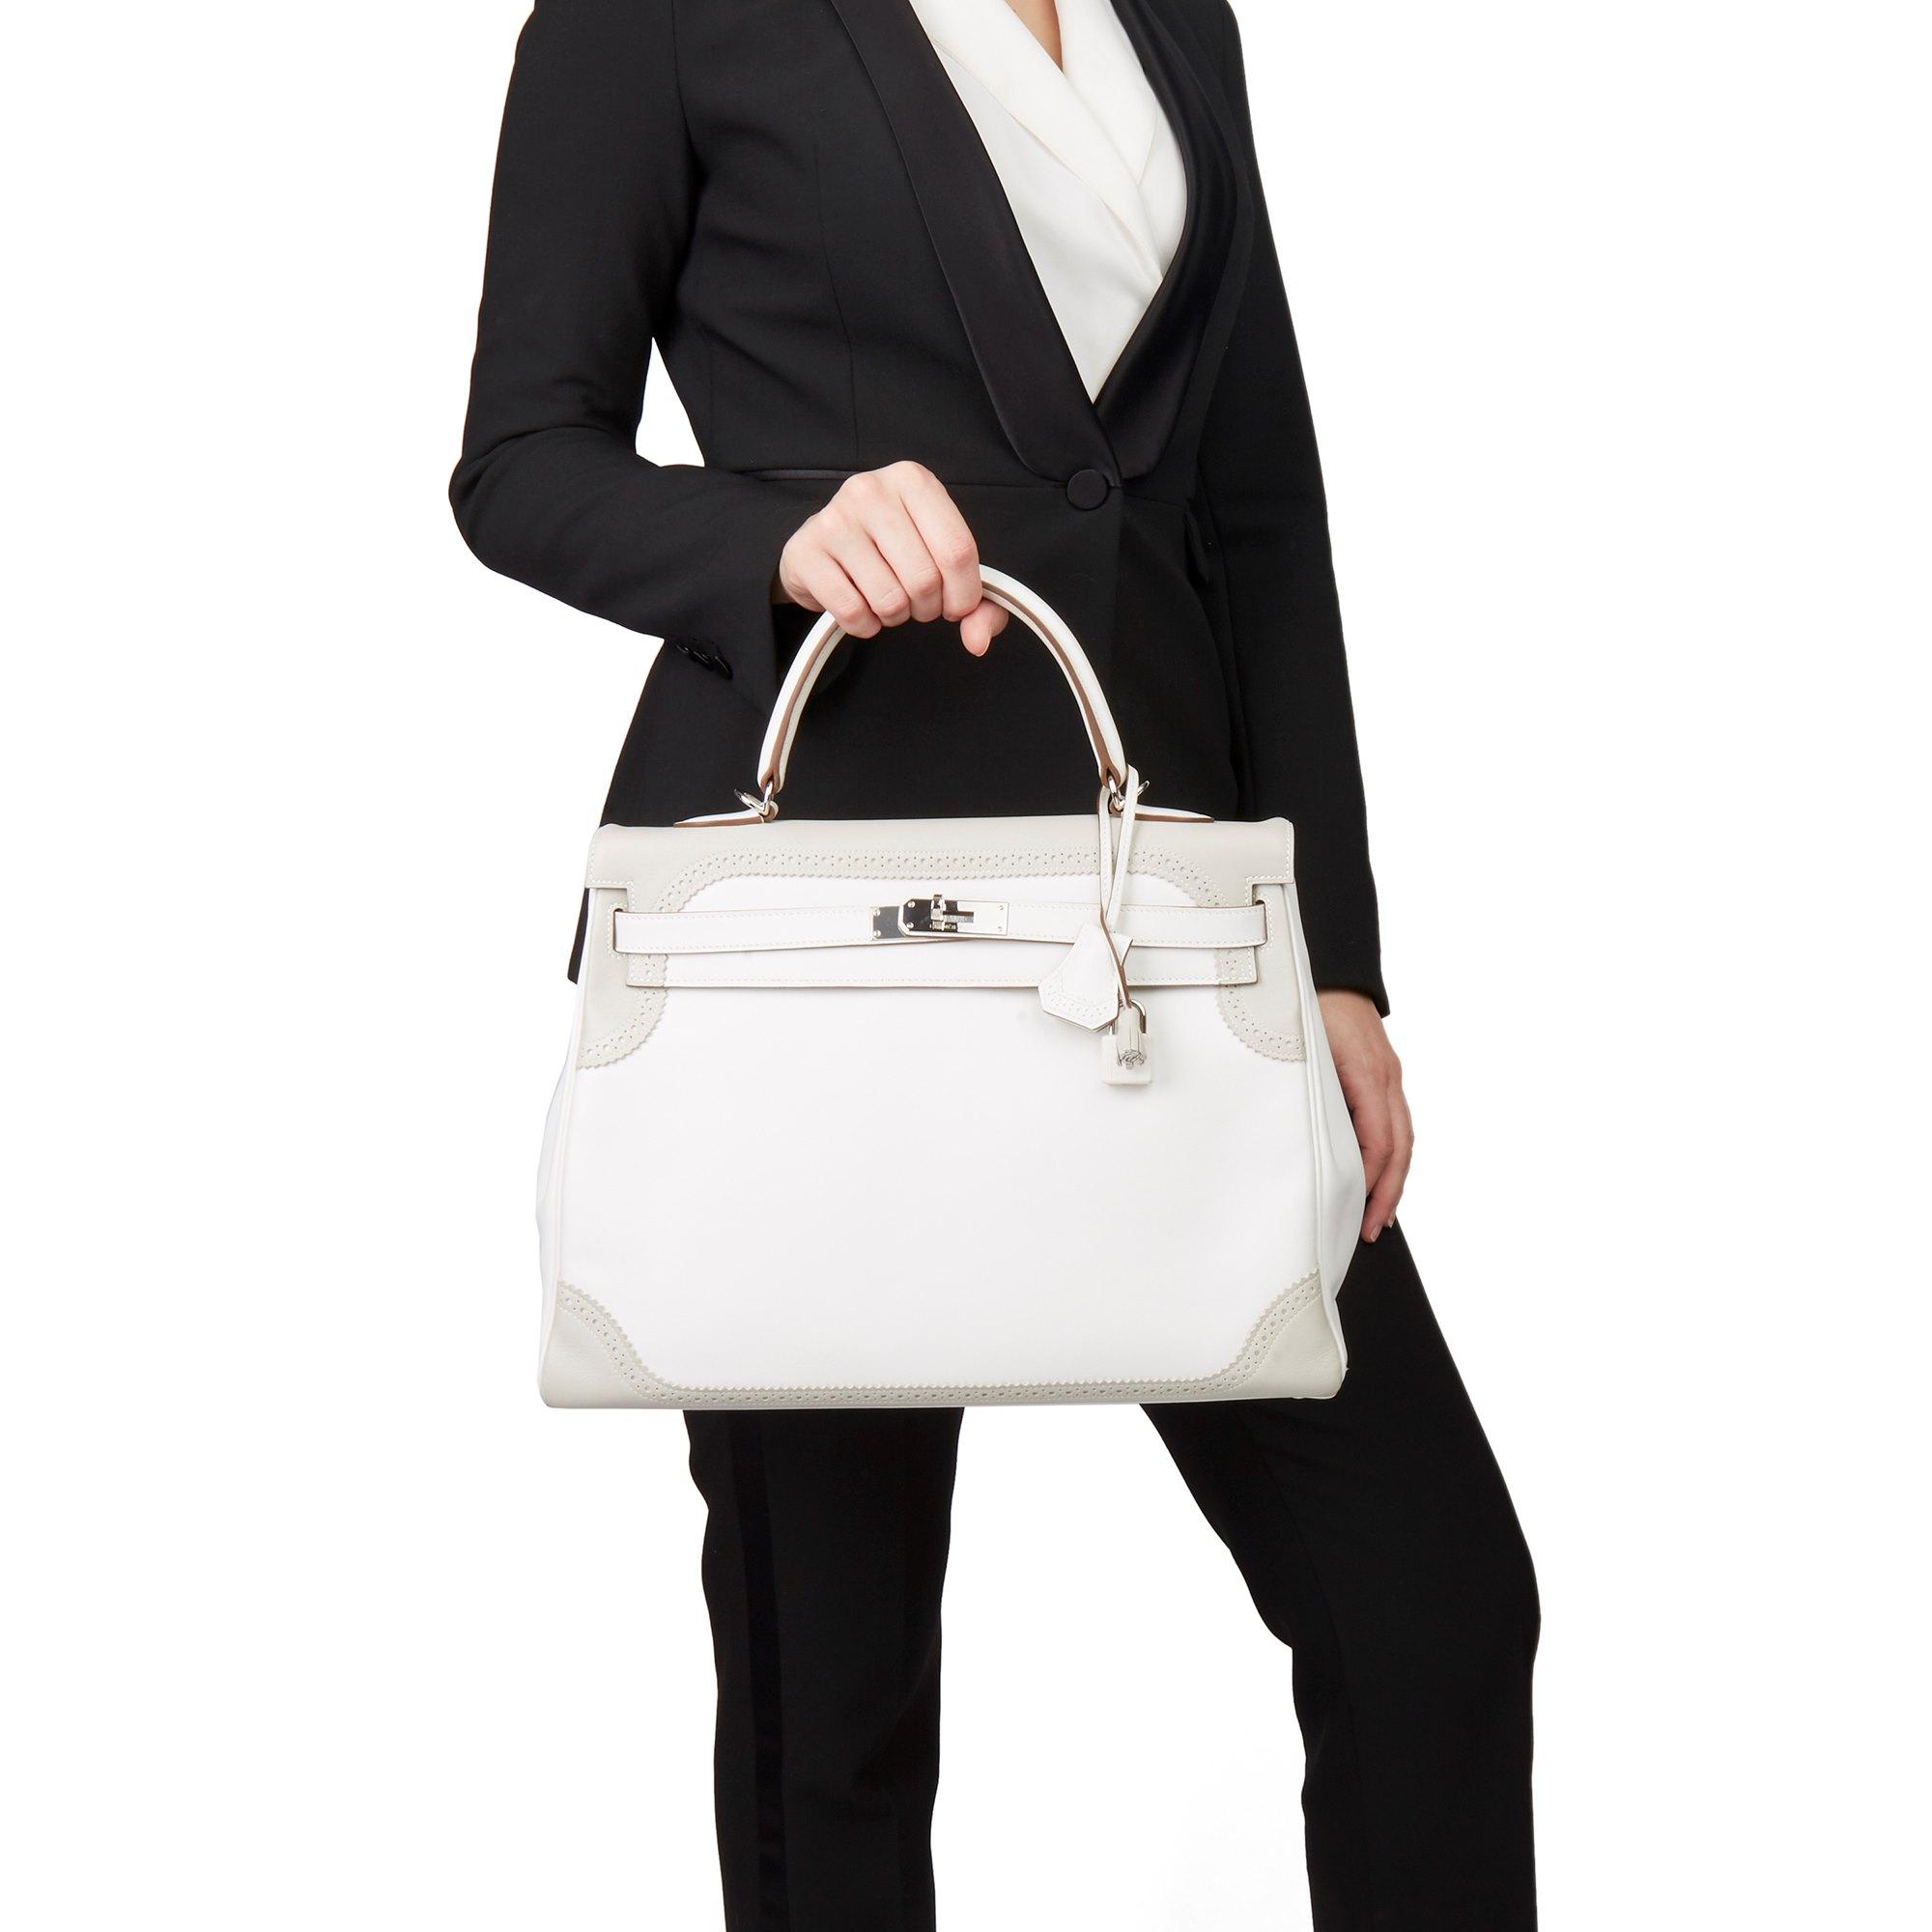 Hermès Blanc & Gris Perle Swift Leather Ghillies Kelly 35cm Retourne